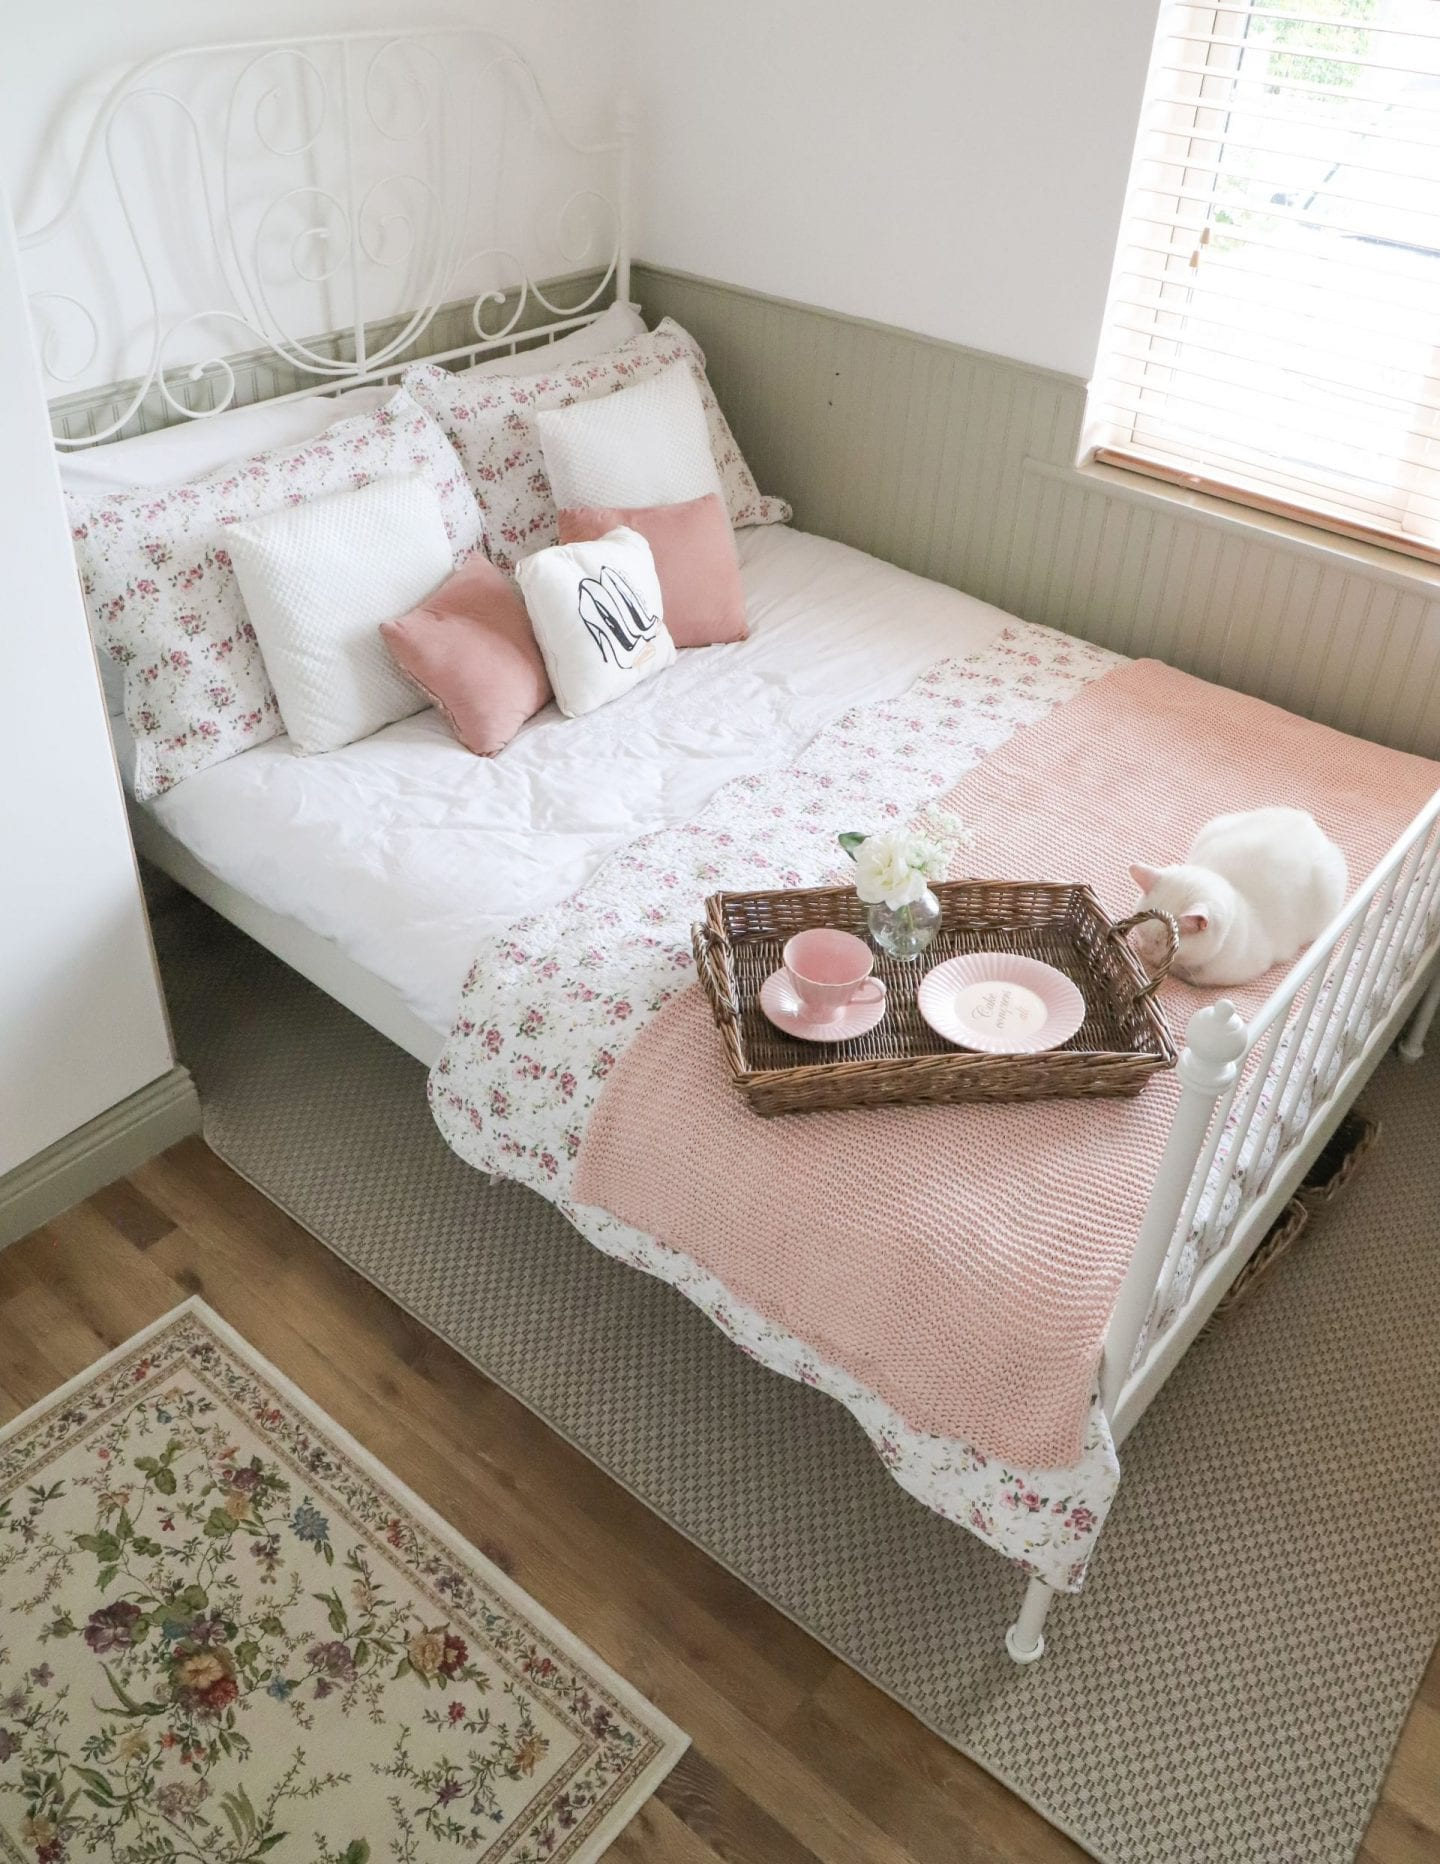 Ikea Leirvik bed frame, small bedroom, boho bedroom decor